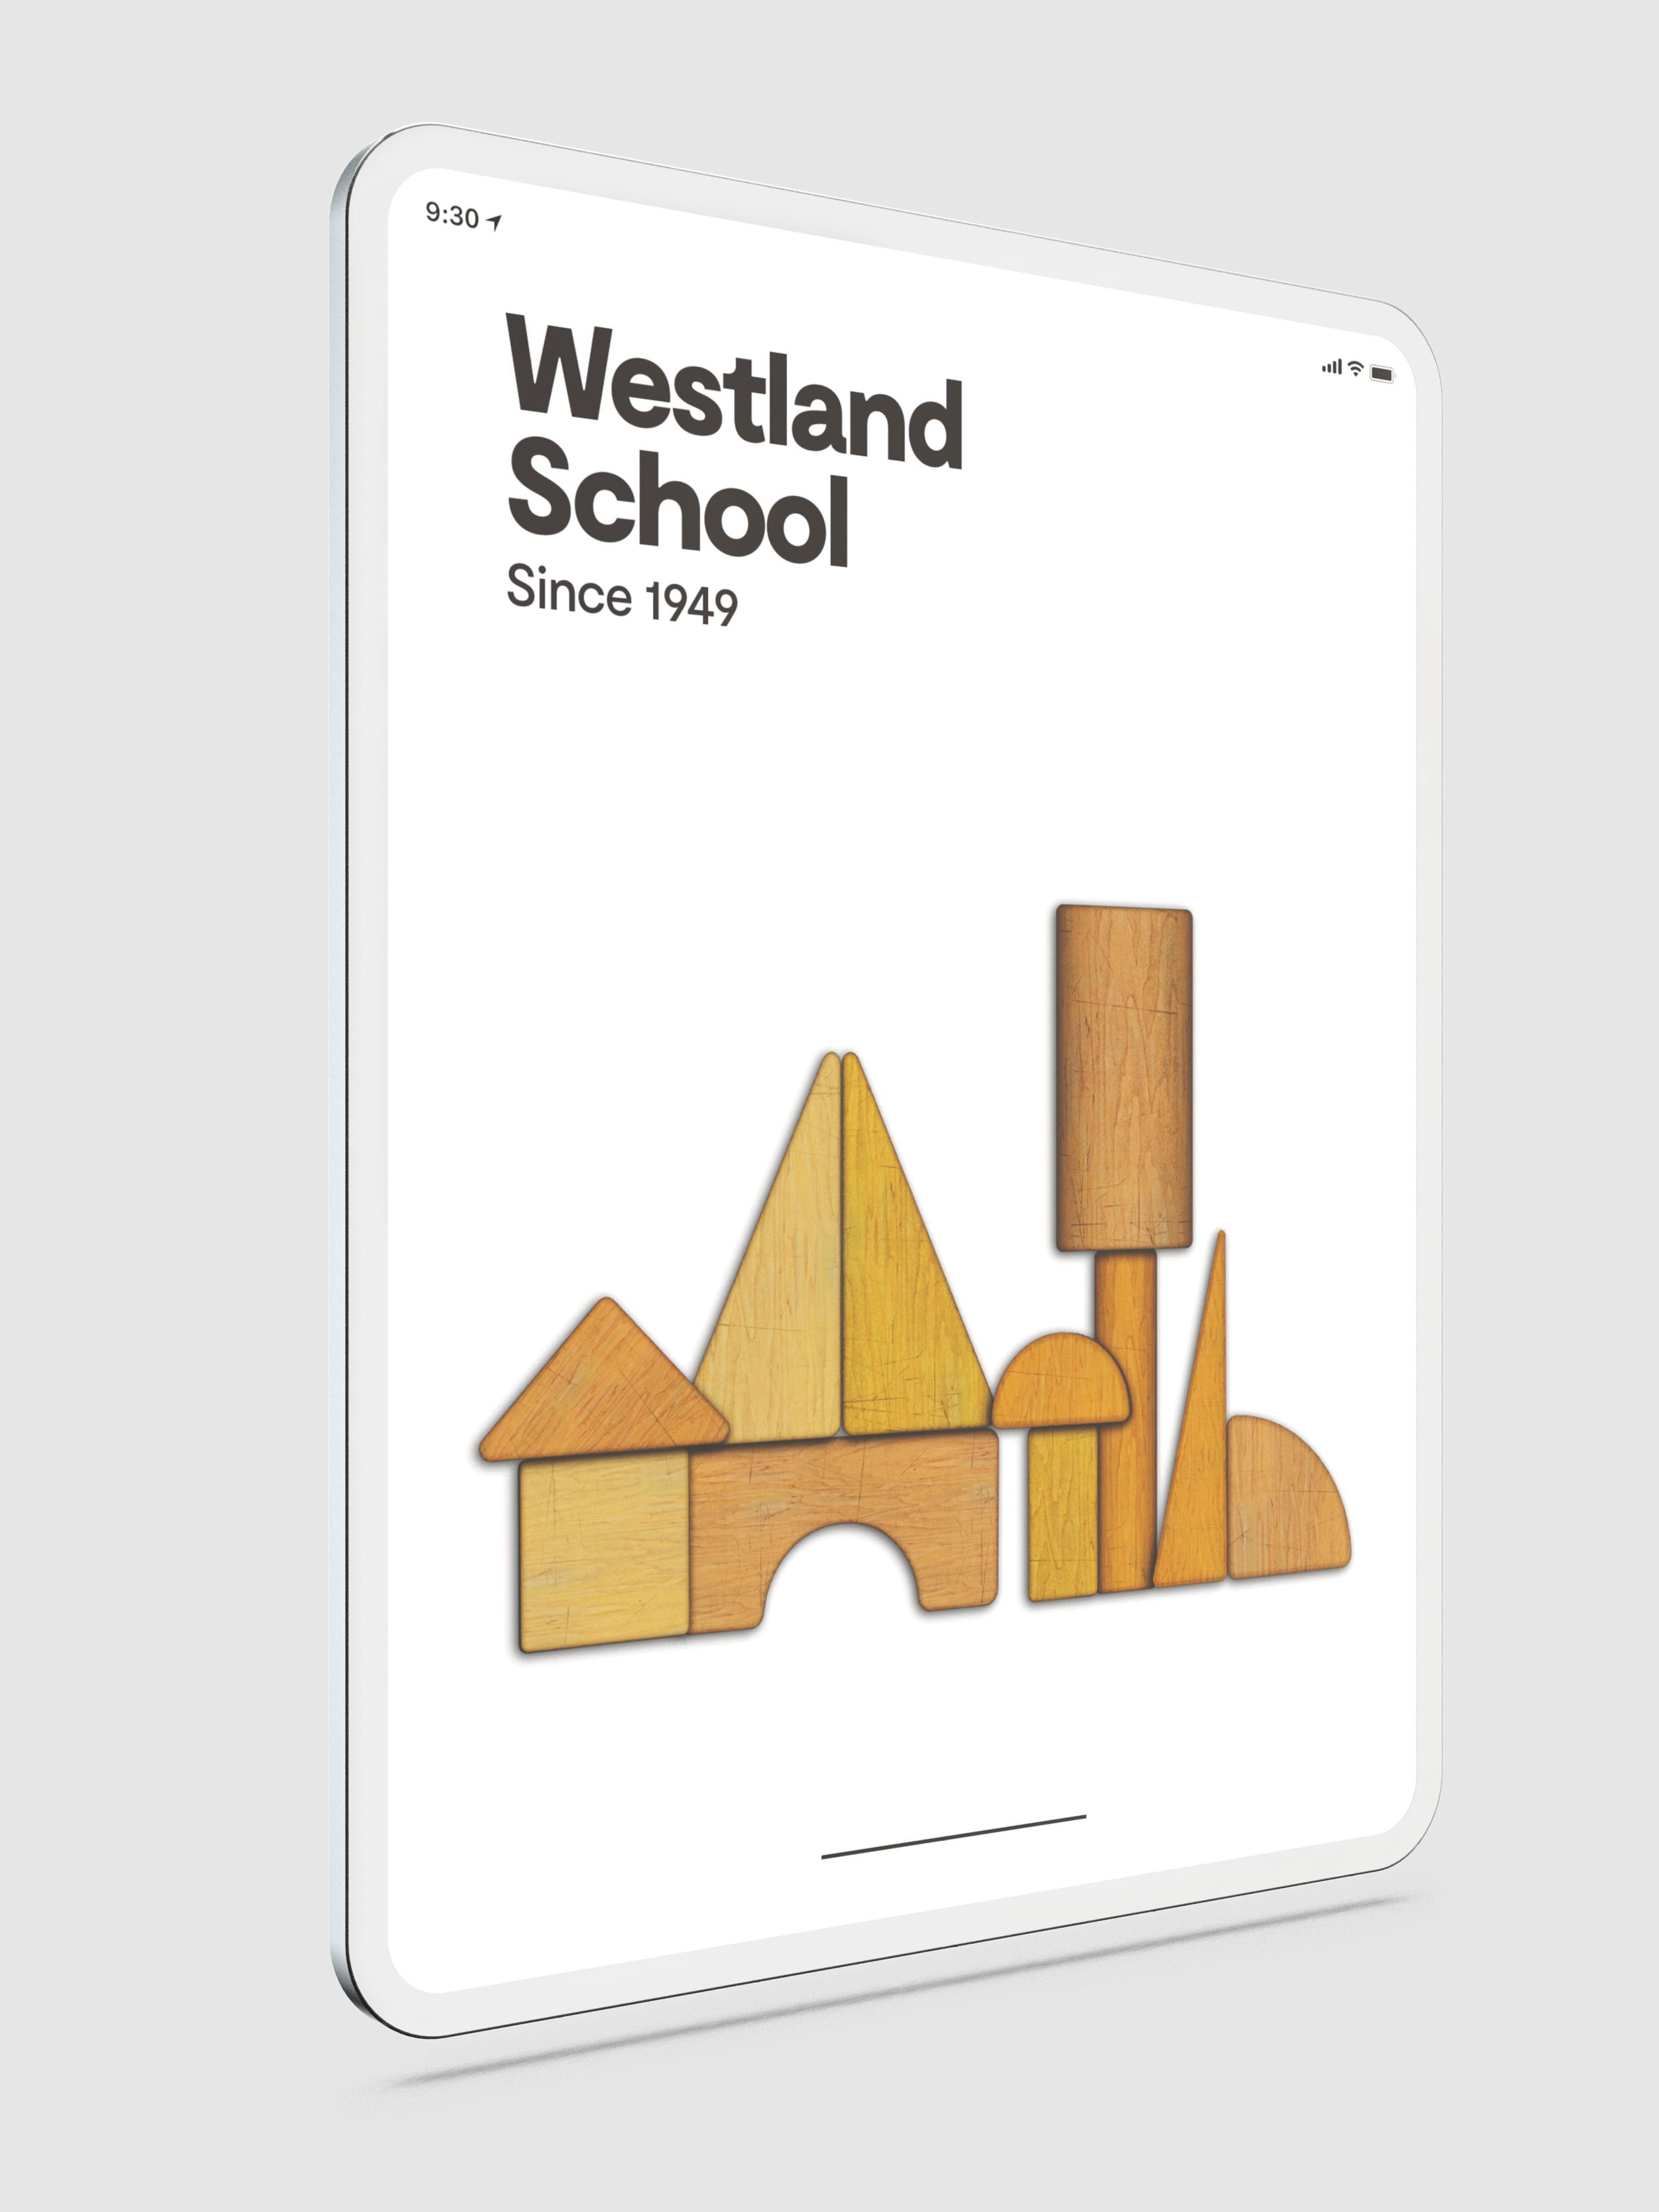 distinc_portfolio_westland_school_web_01.jpg